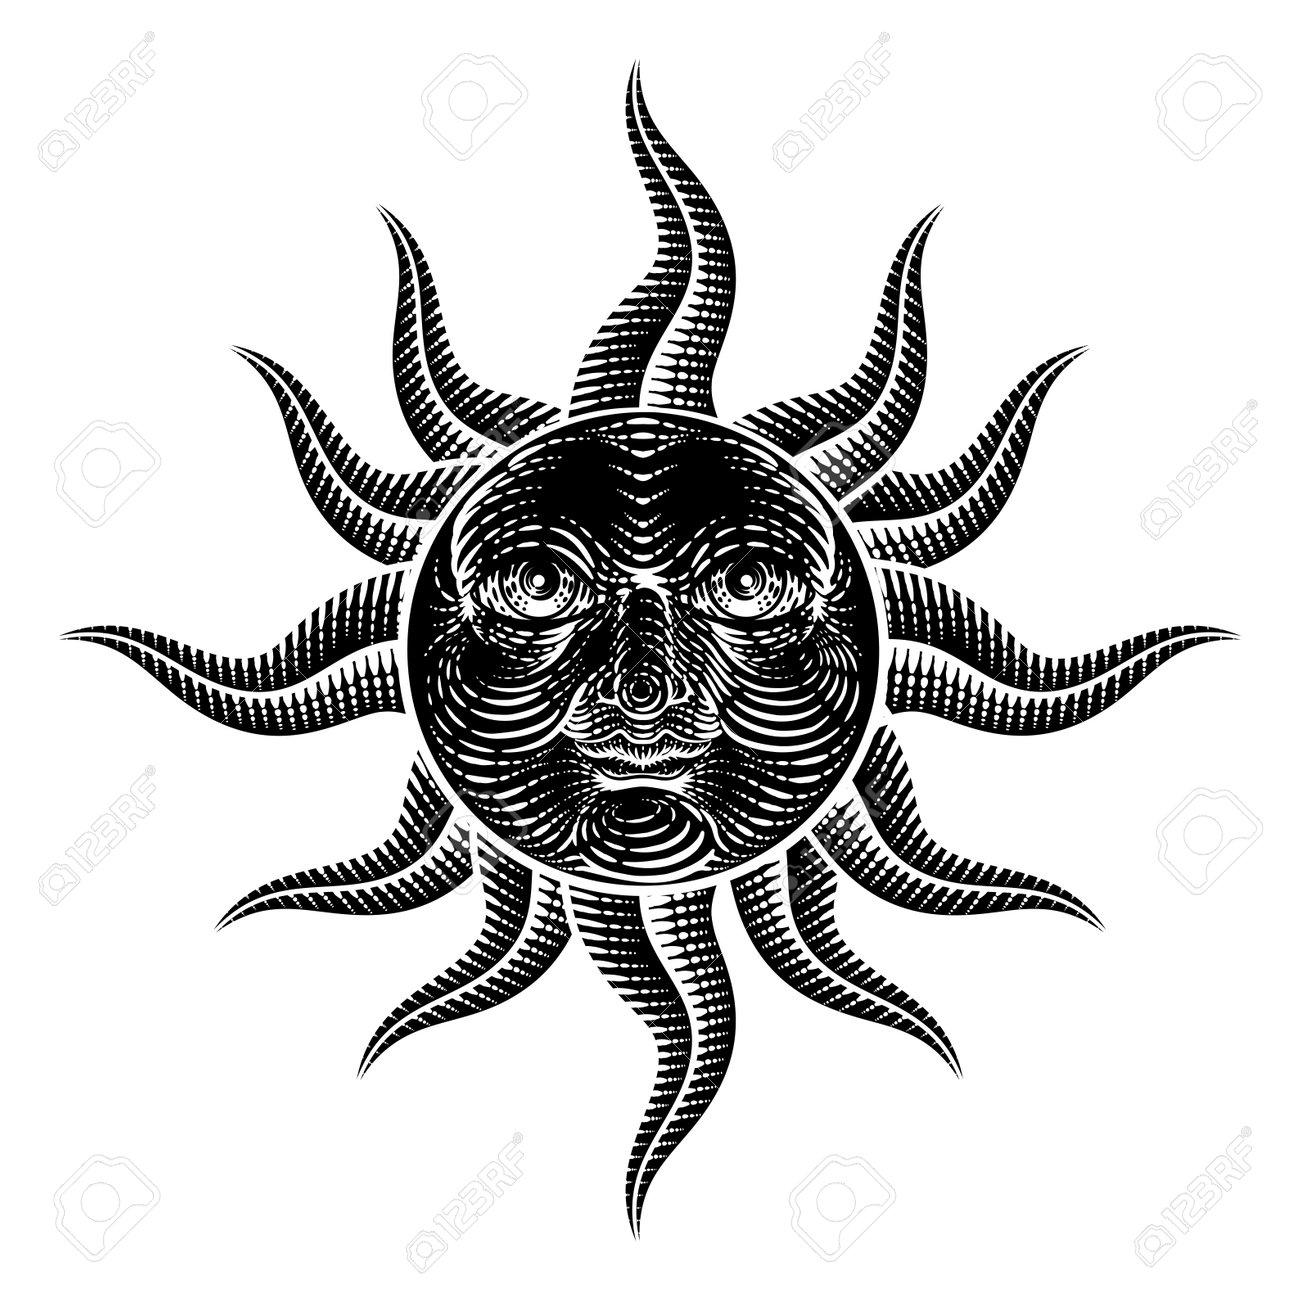 Sun Face Woodcut Drawing Retro Vintage Engraving - 171717424